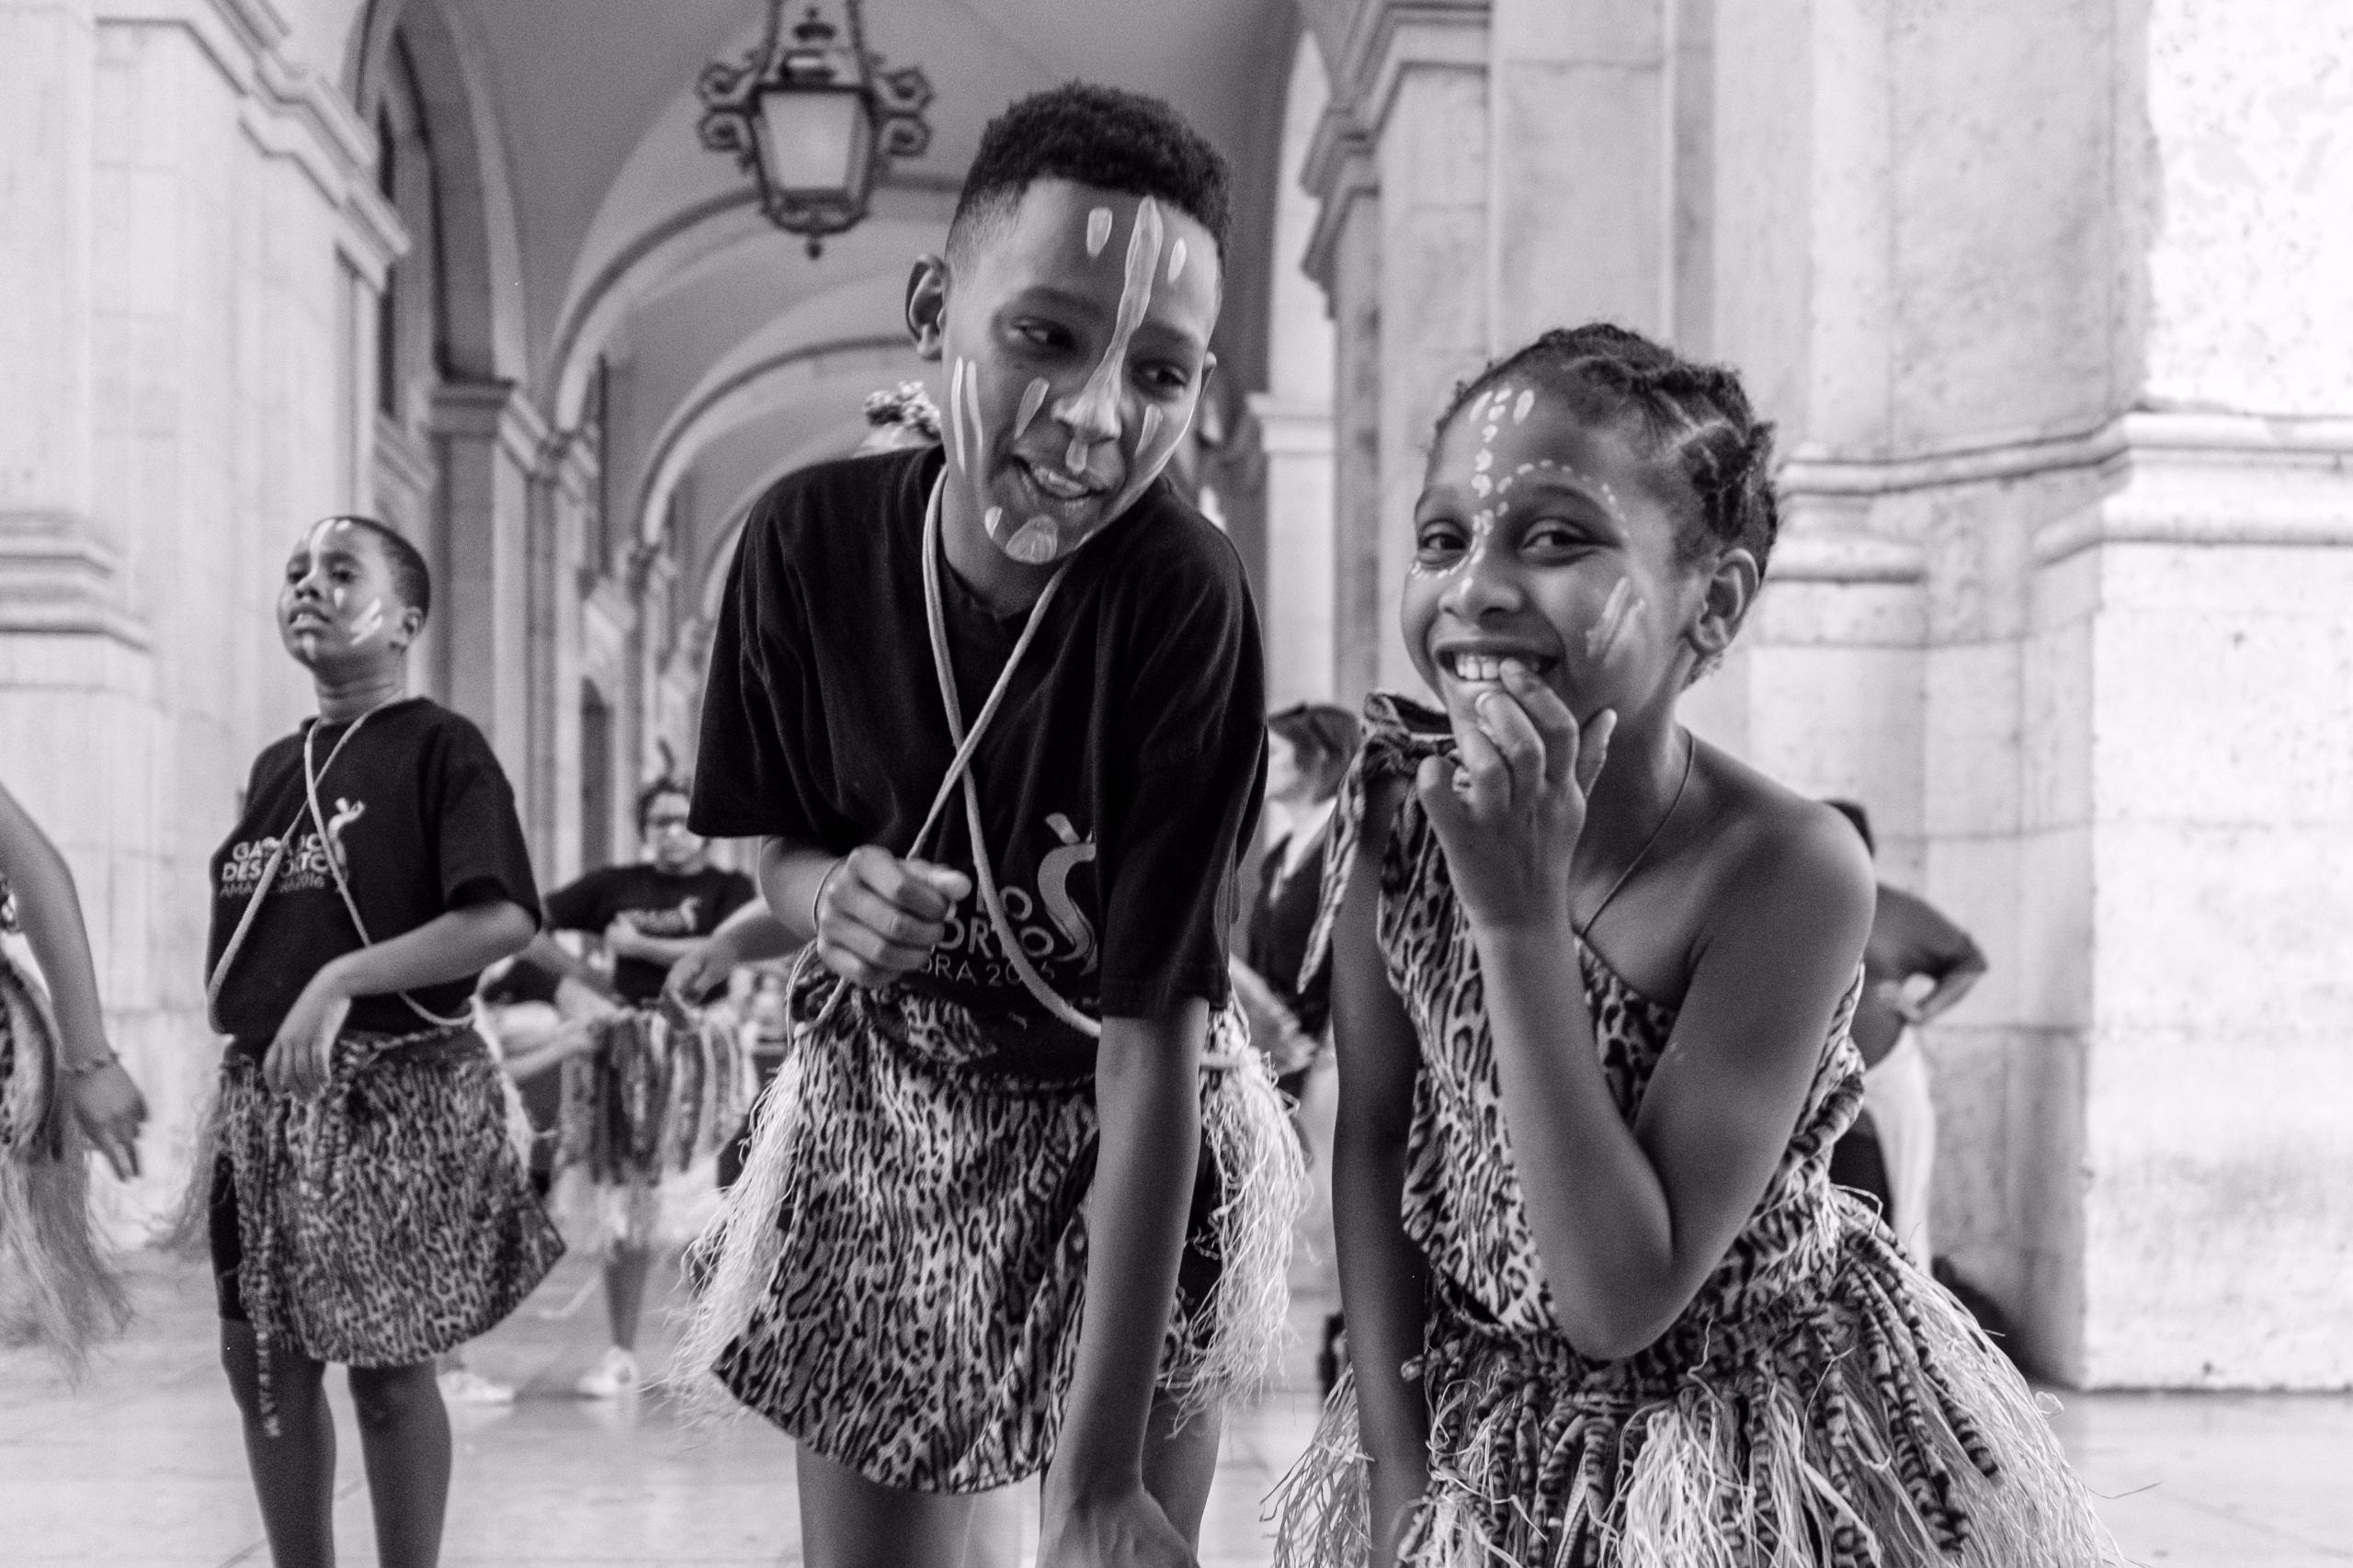 Busking Dancers Lisboa, Portuga - giseleduprez | ello